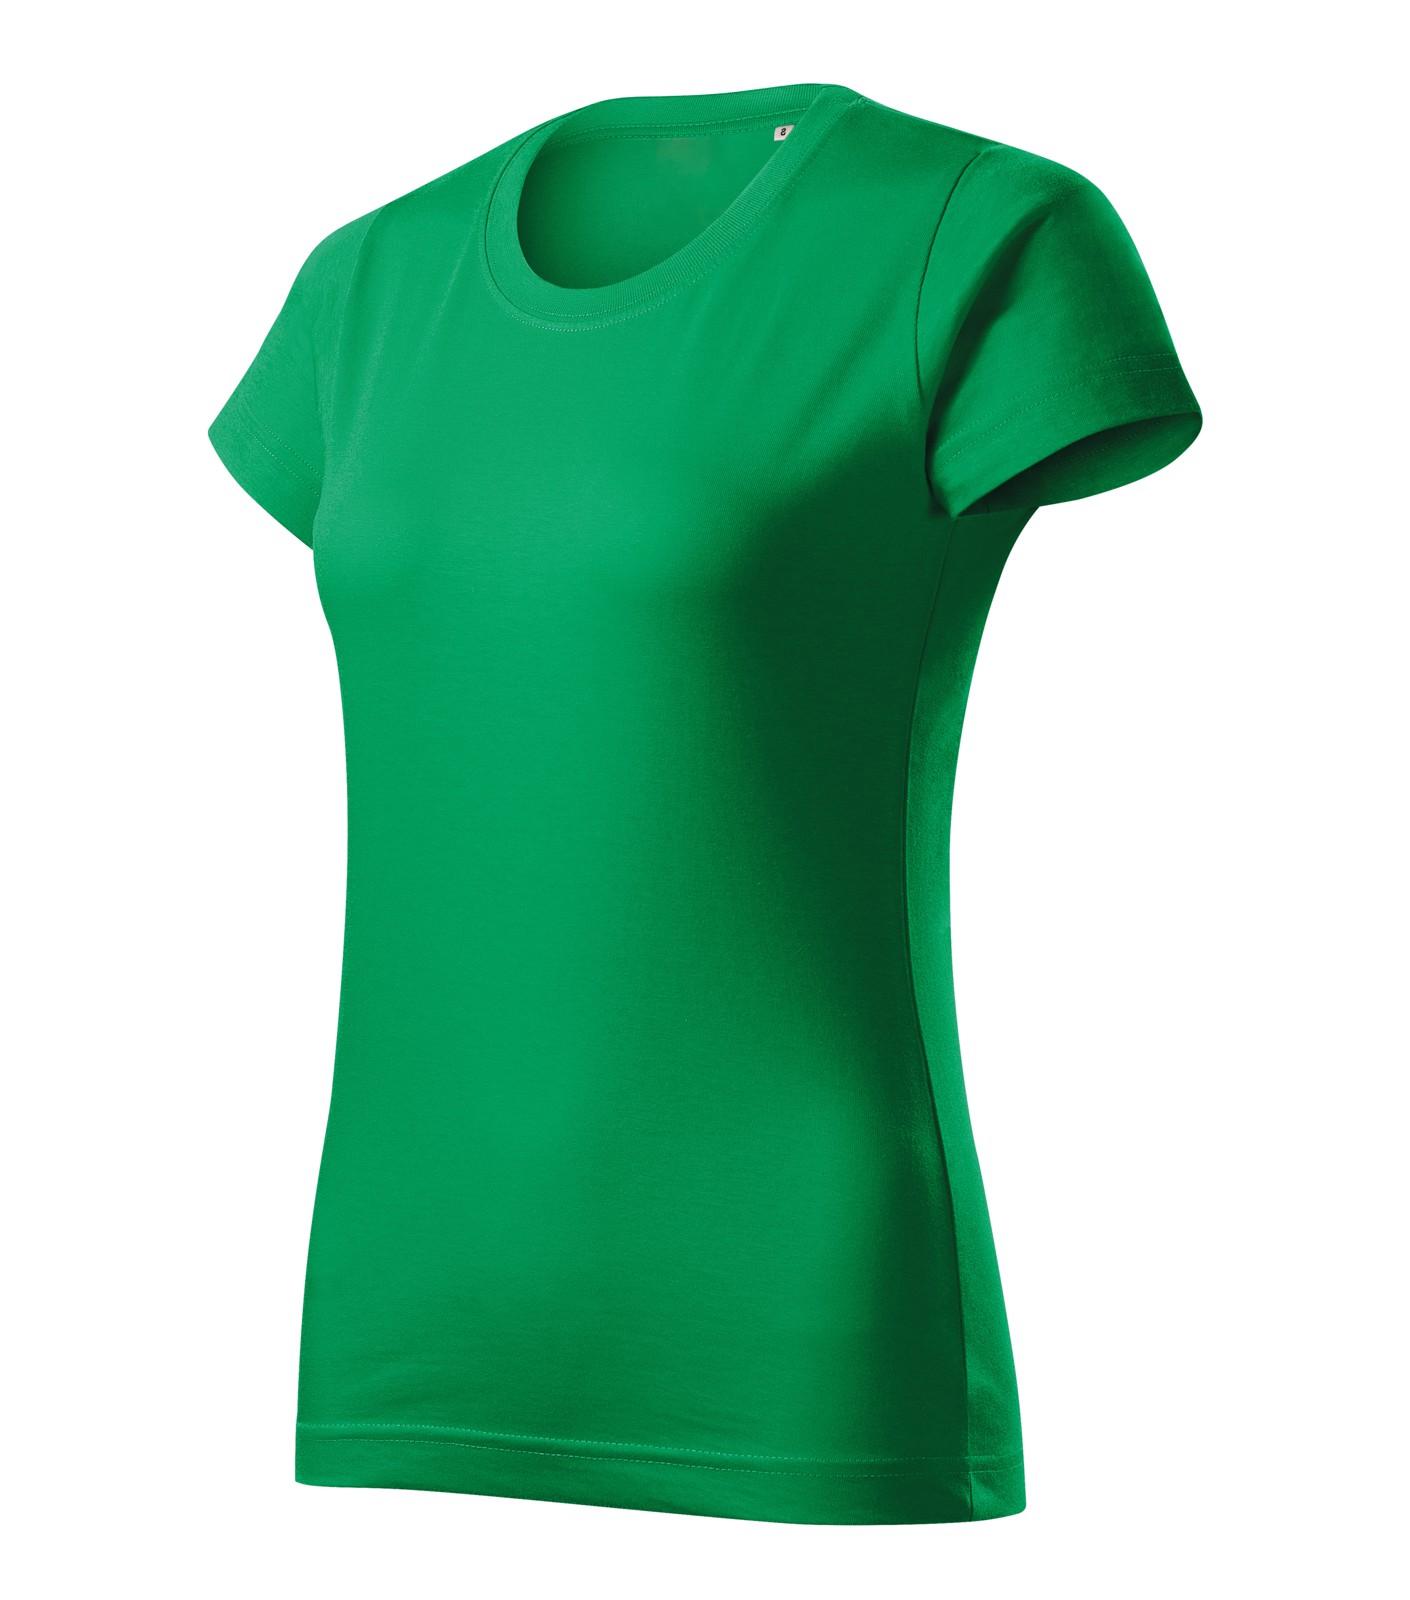 T-shirt women's Malfini Basic Free - Kelly Green / 2XL